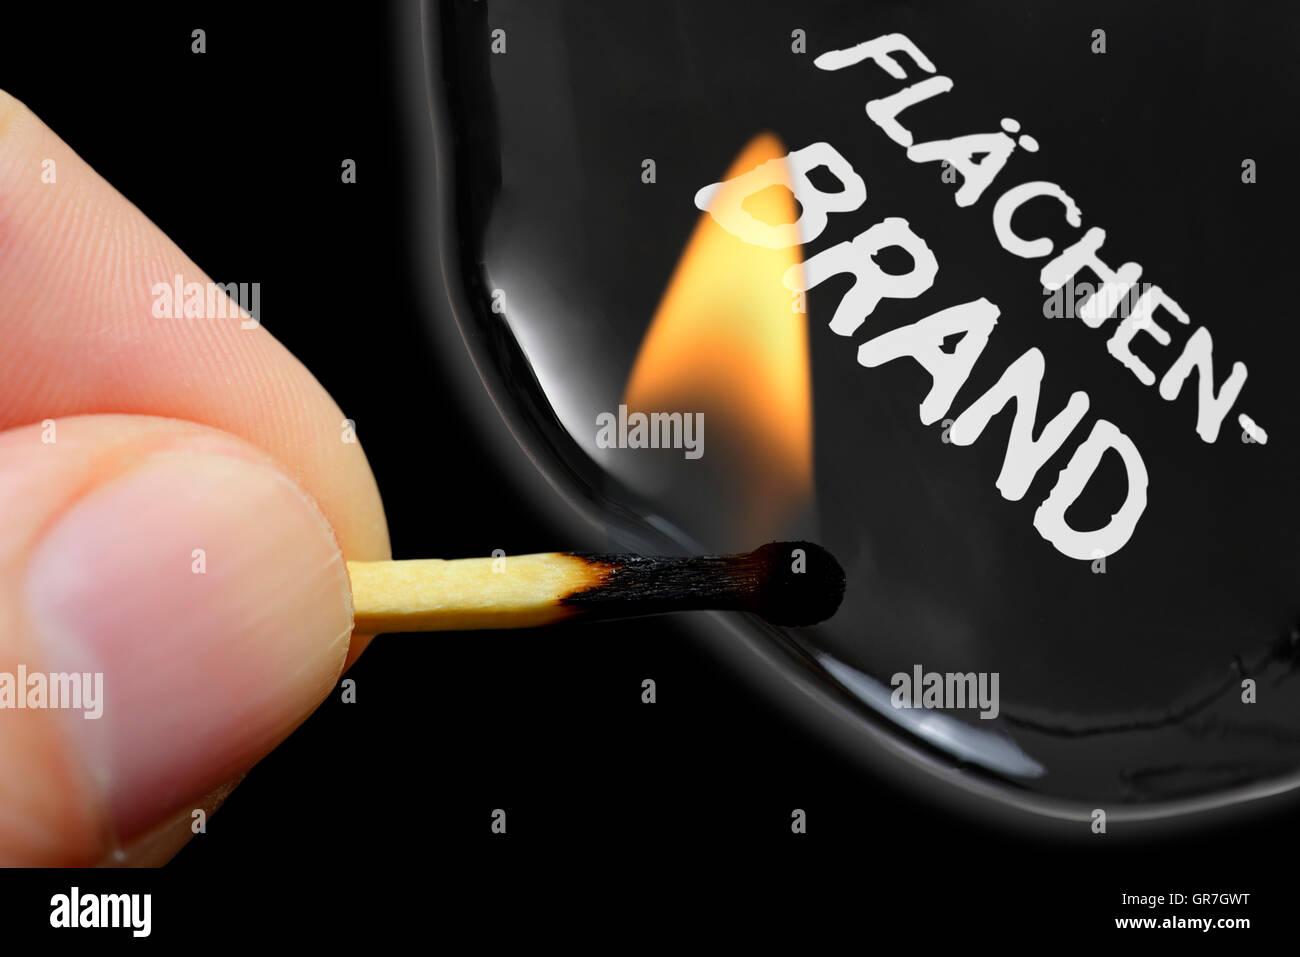 Finger Holding Burning Match, Terror Threats - Stock Image